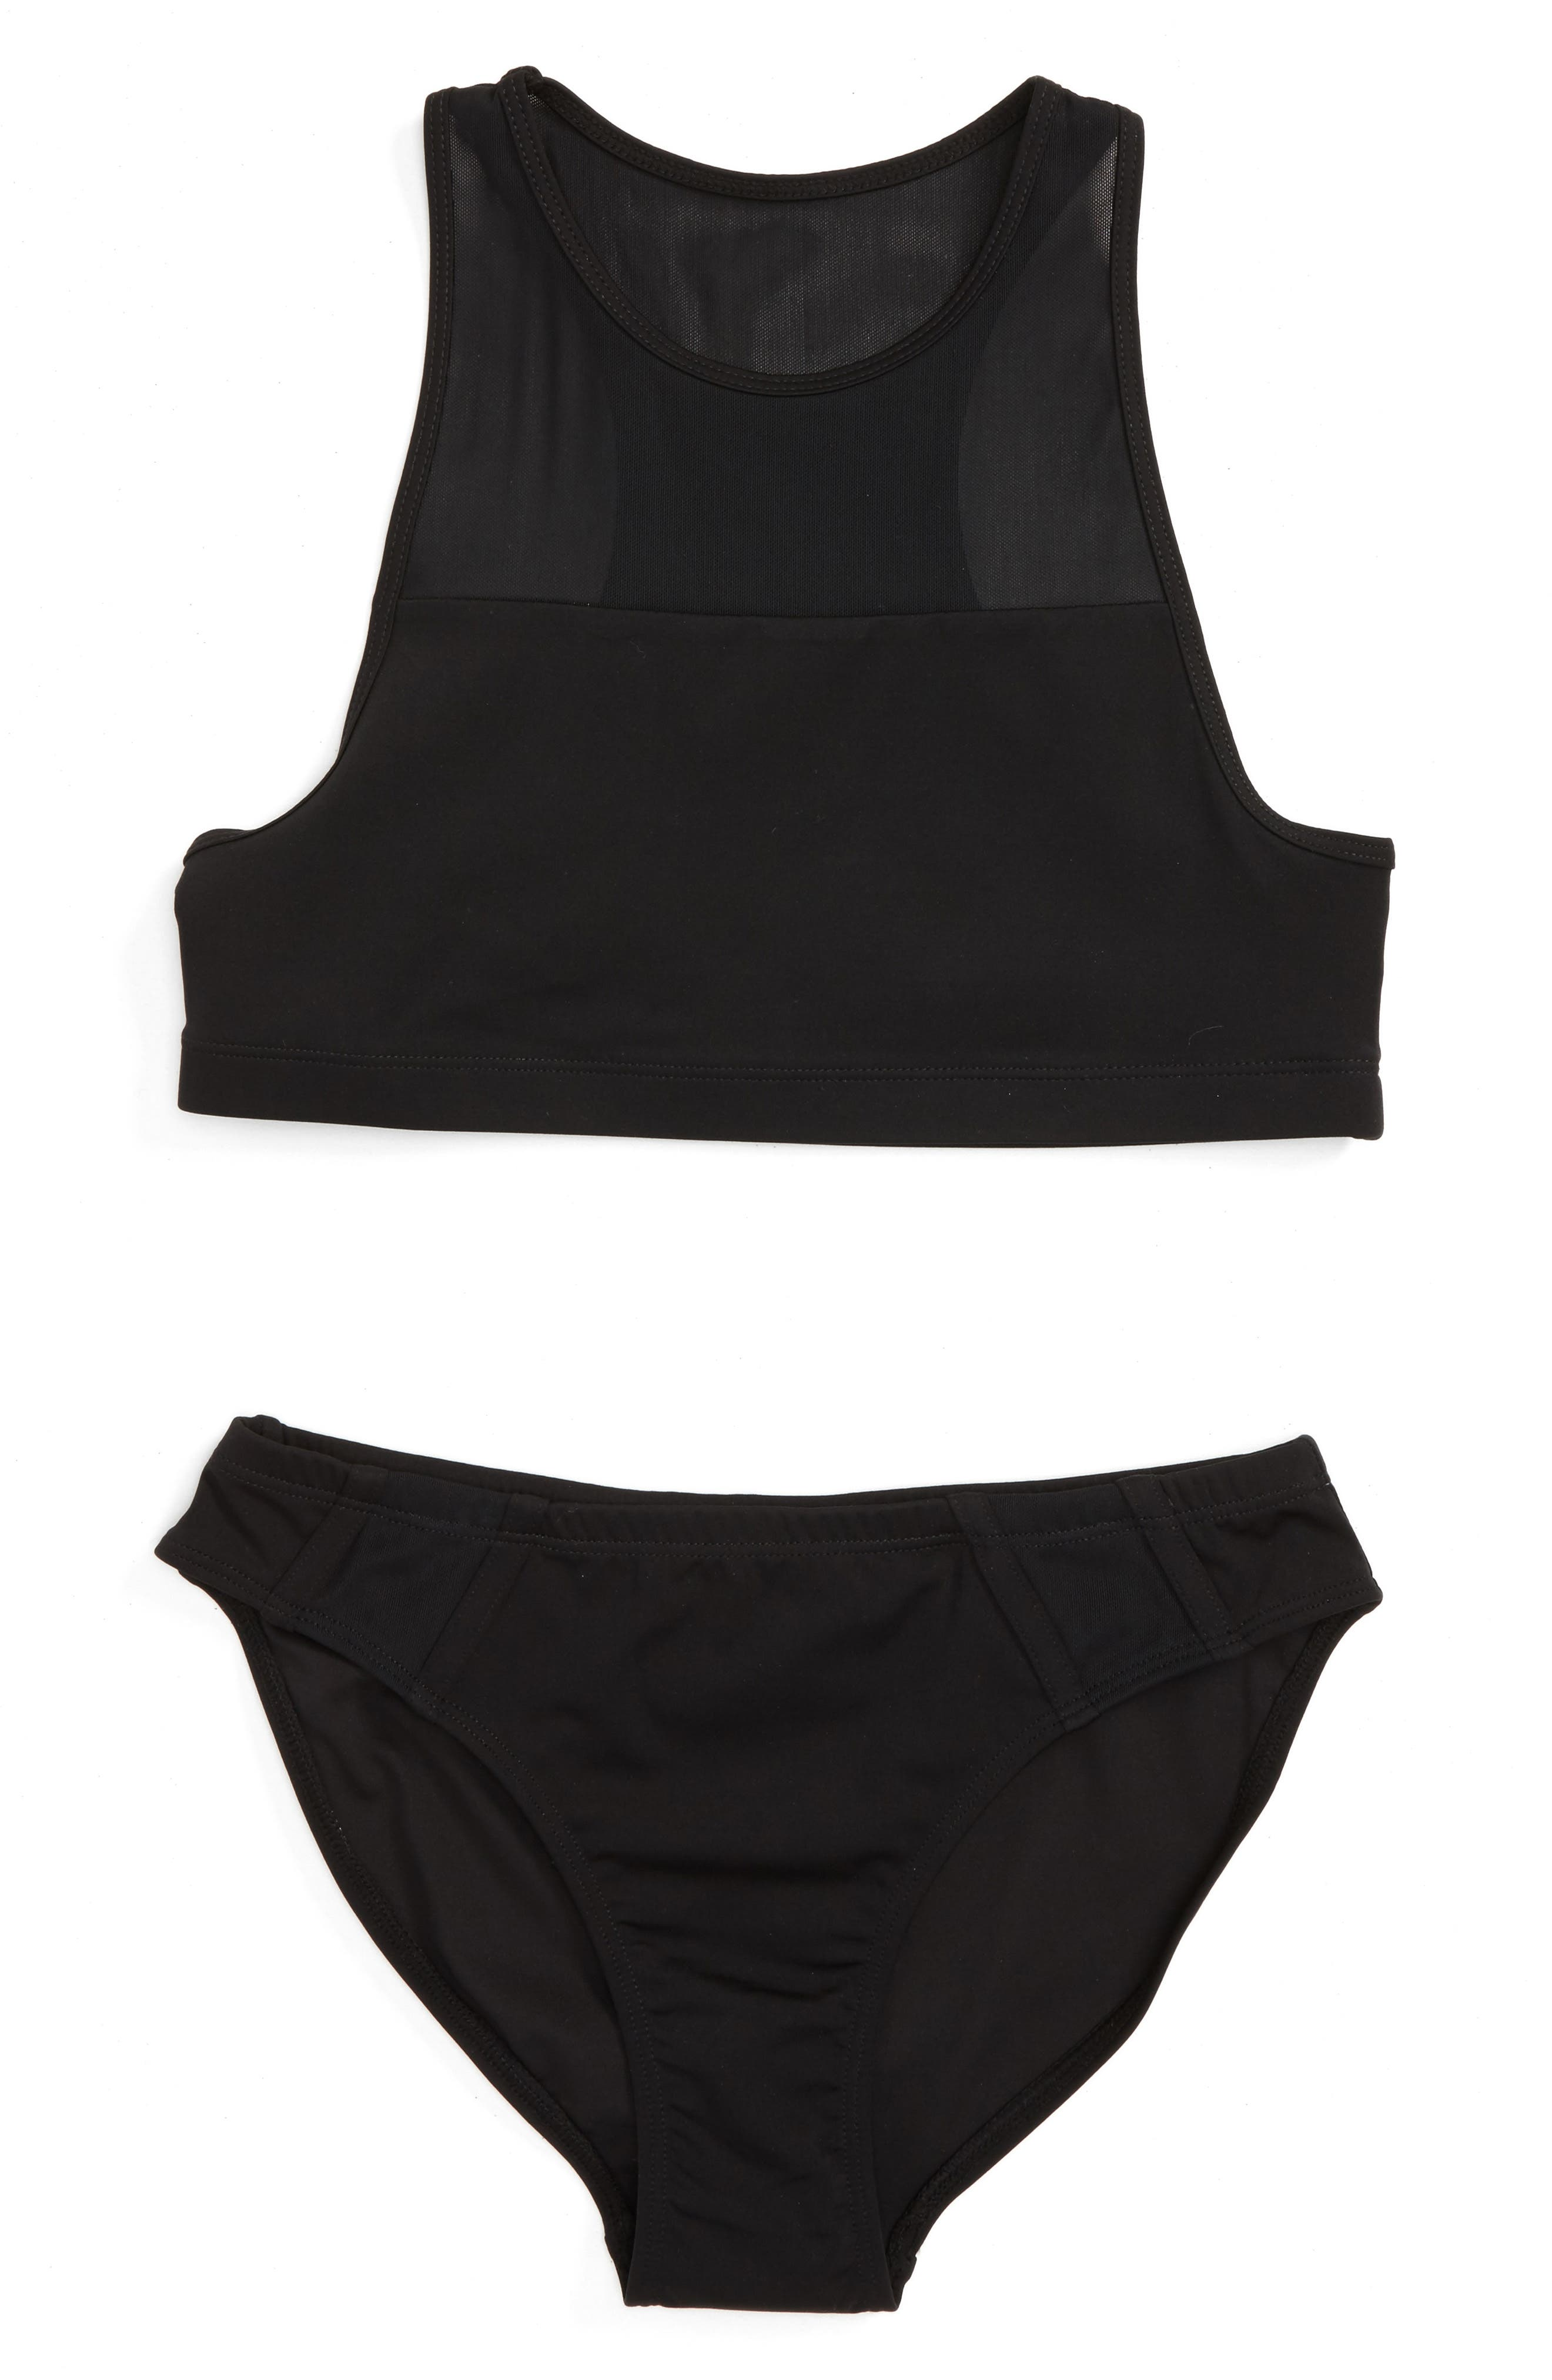 Zella Girl Mesh Trim Two-Piece Swimsuit